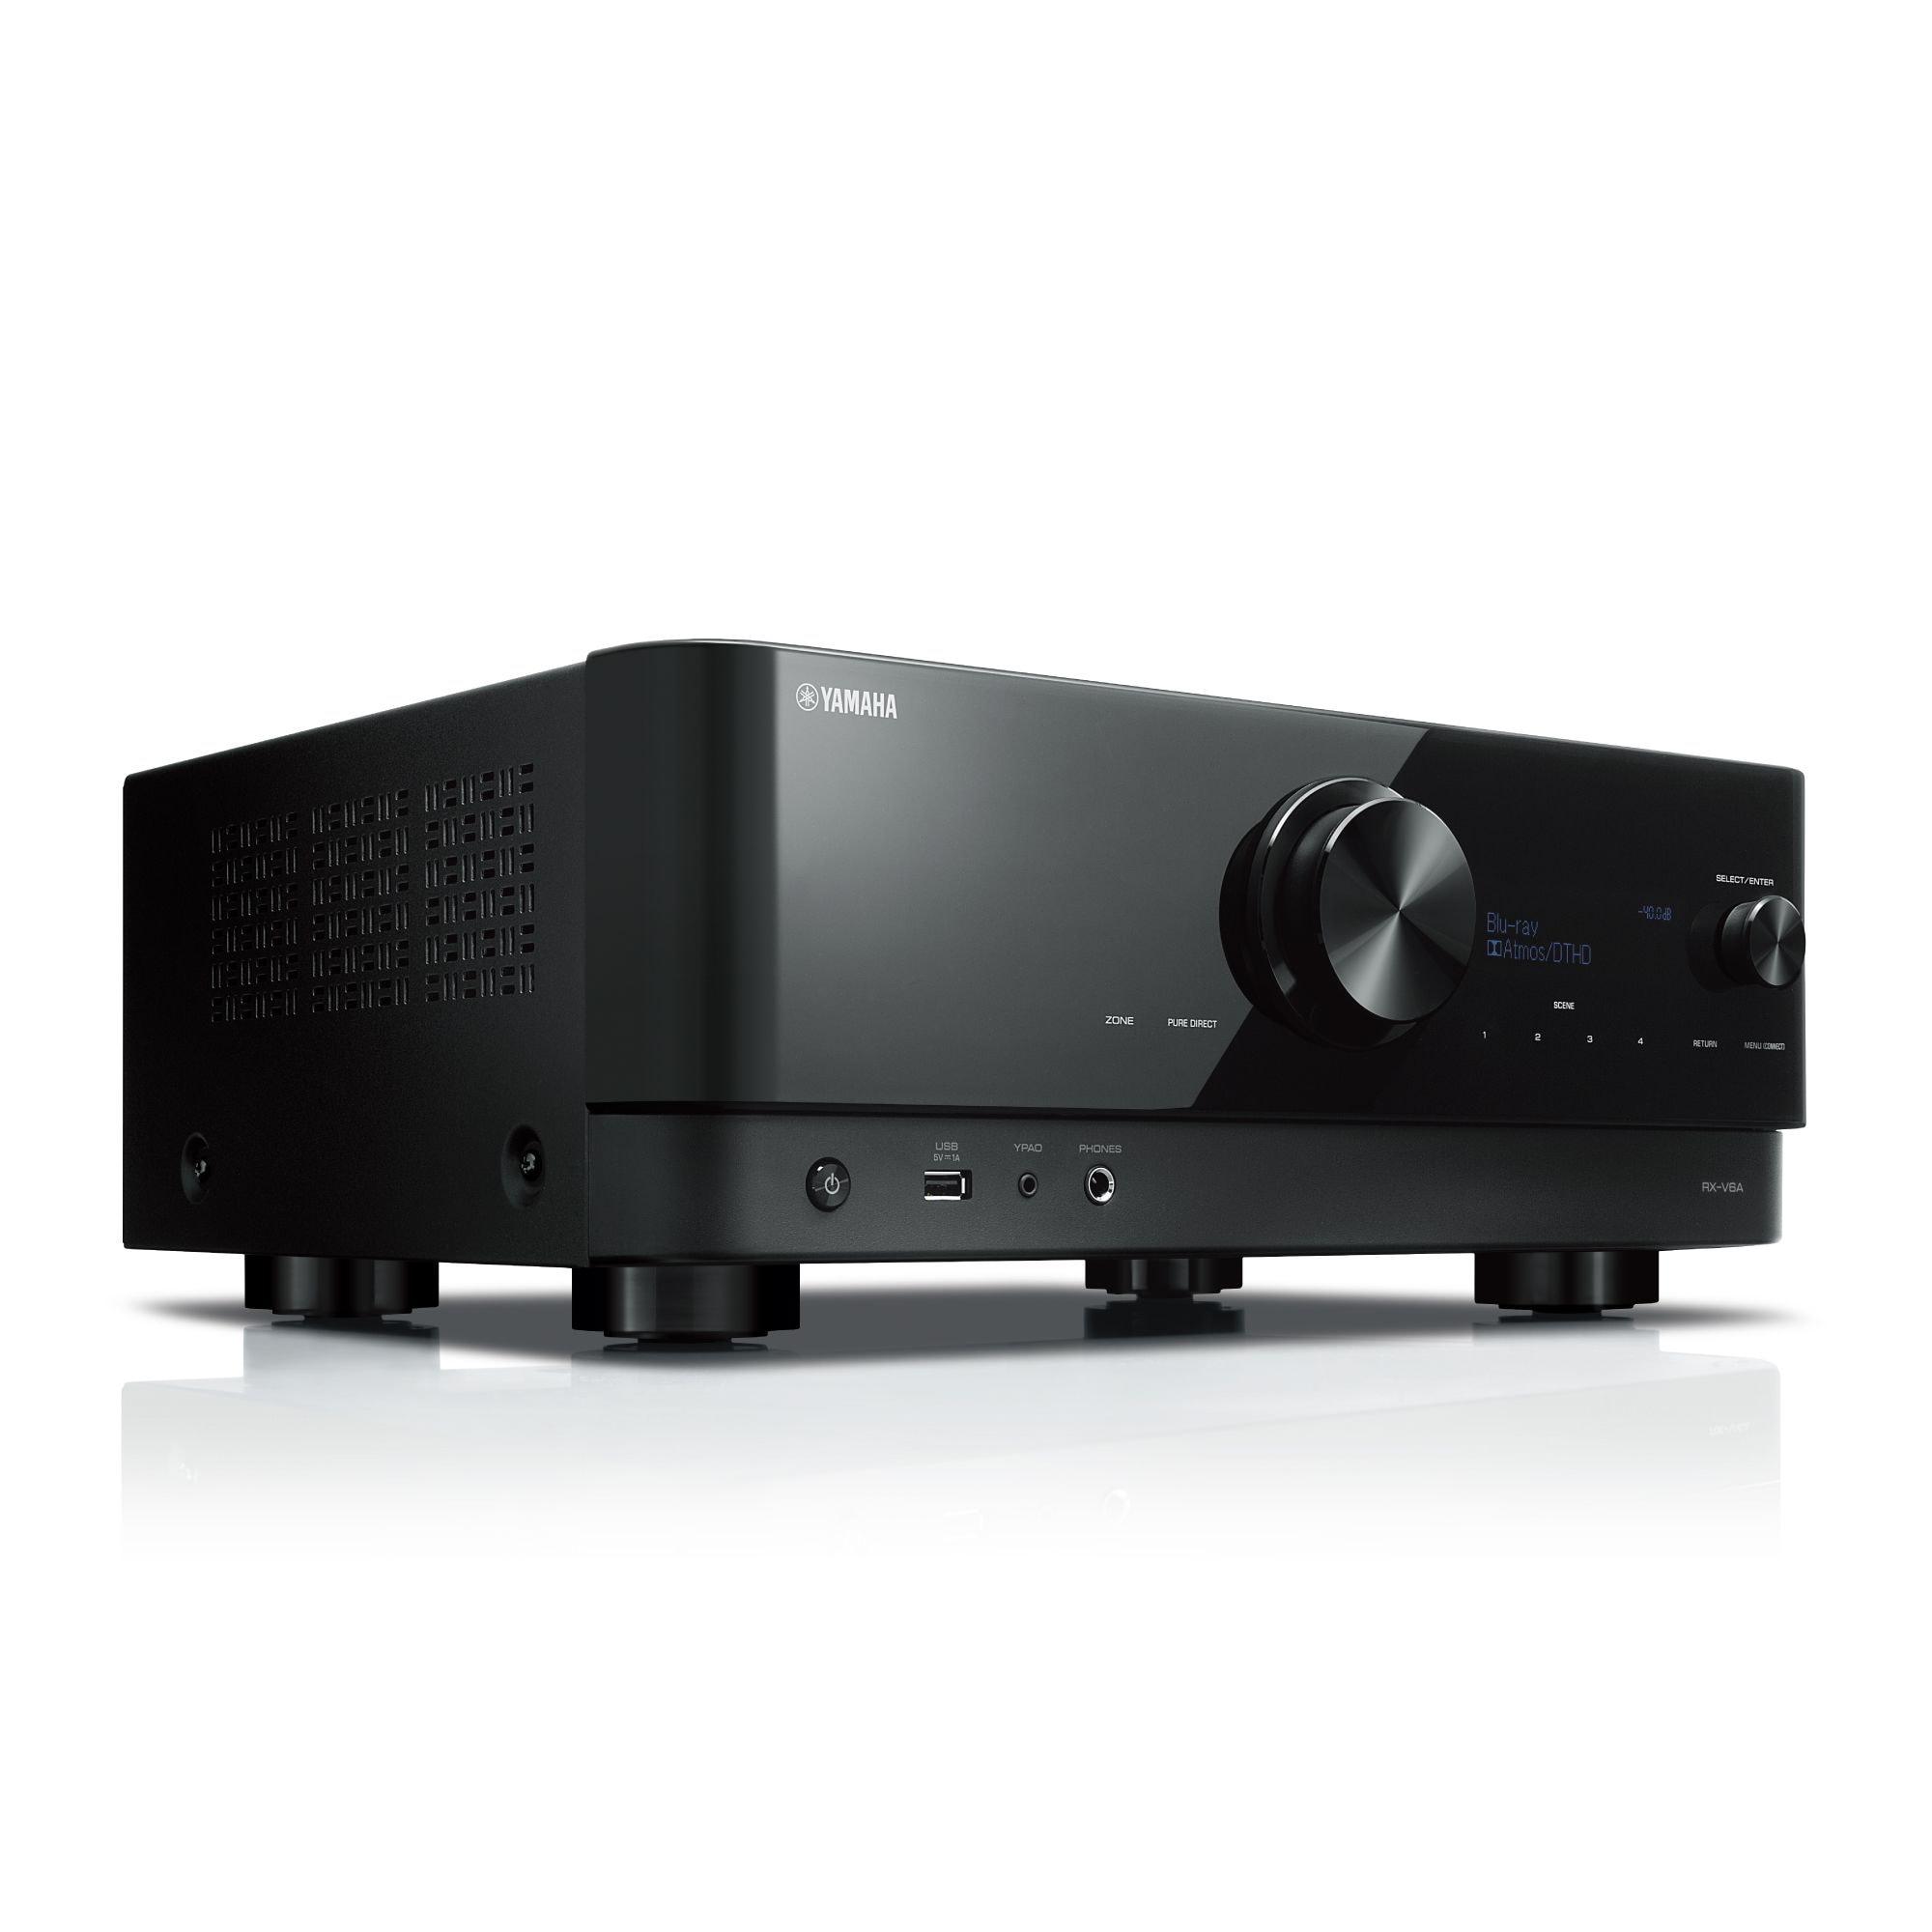 Yamaha RXV6A | Récepteur Cinéma Maison AV Dolby 4K / 8K | 7.2 Canaux | Avec Bluetooth (RX-V6A)